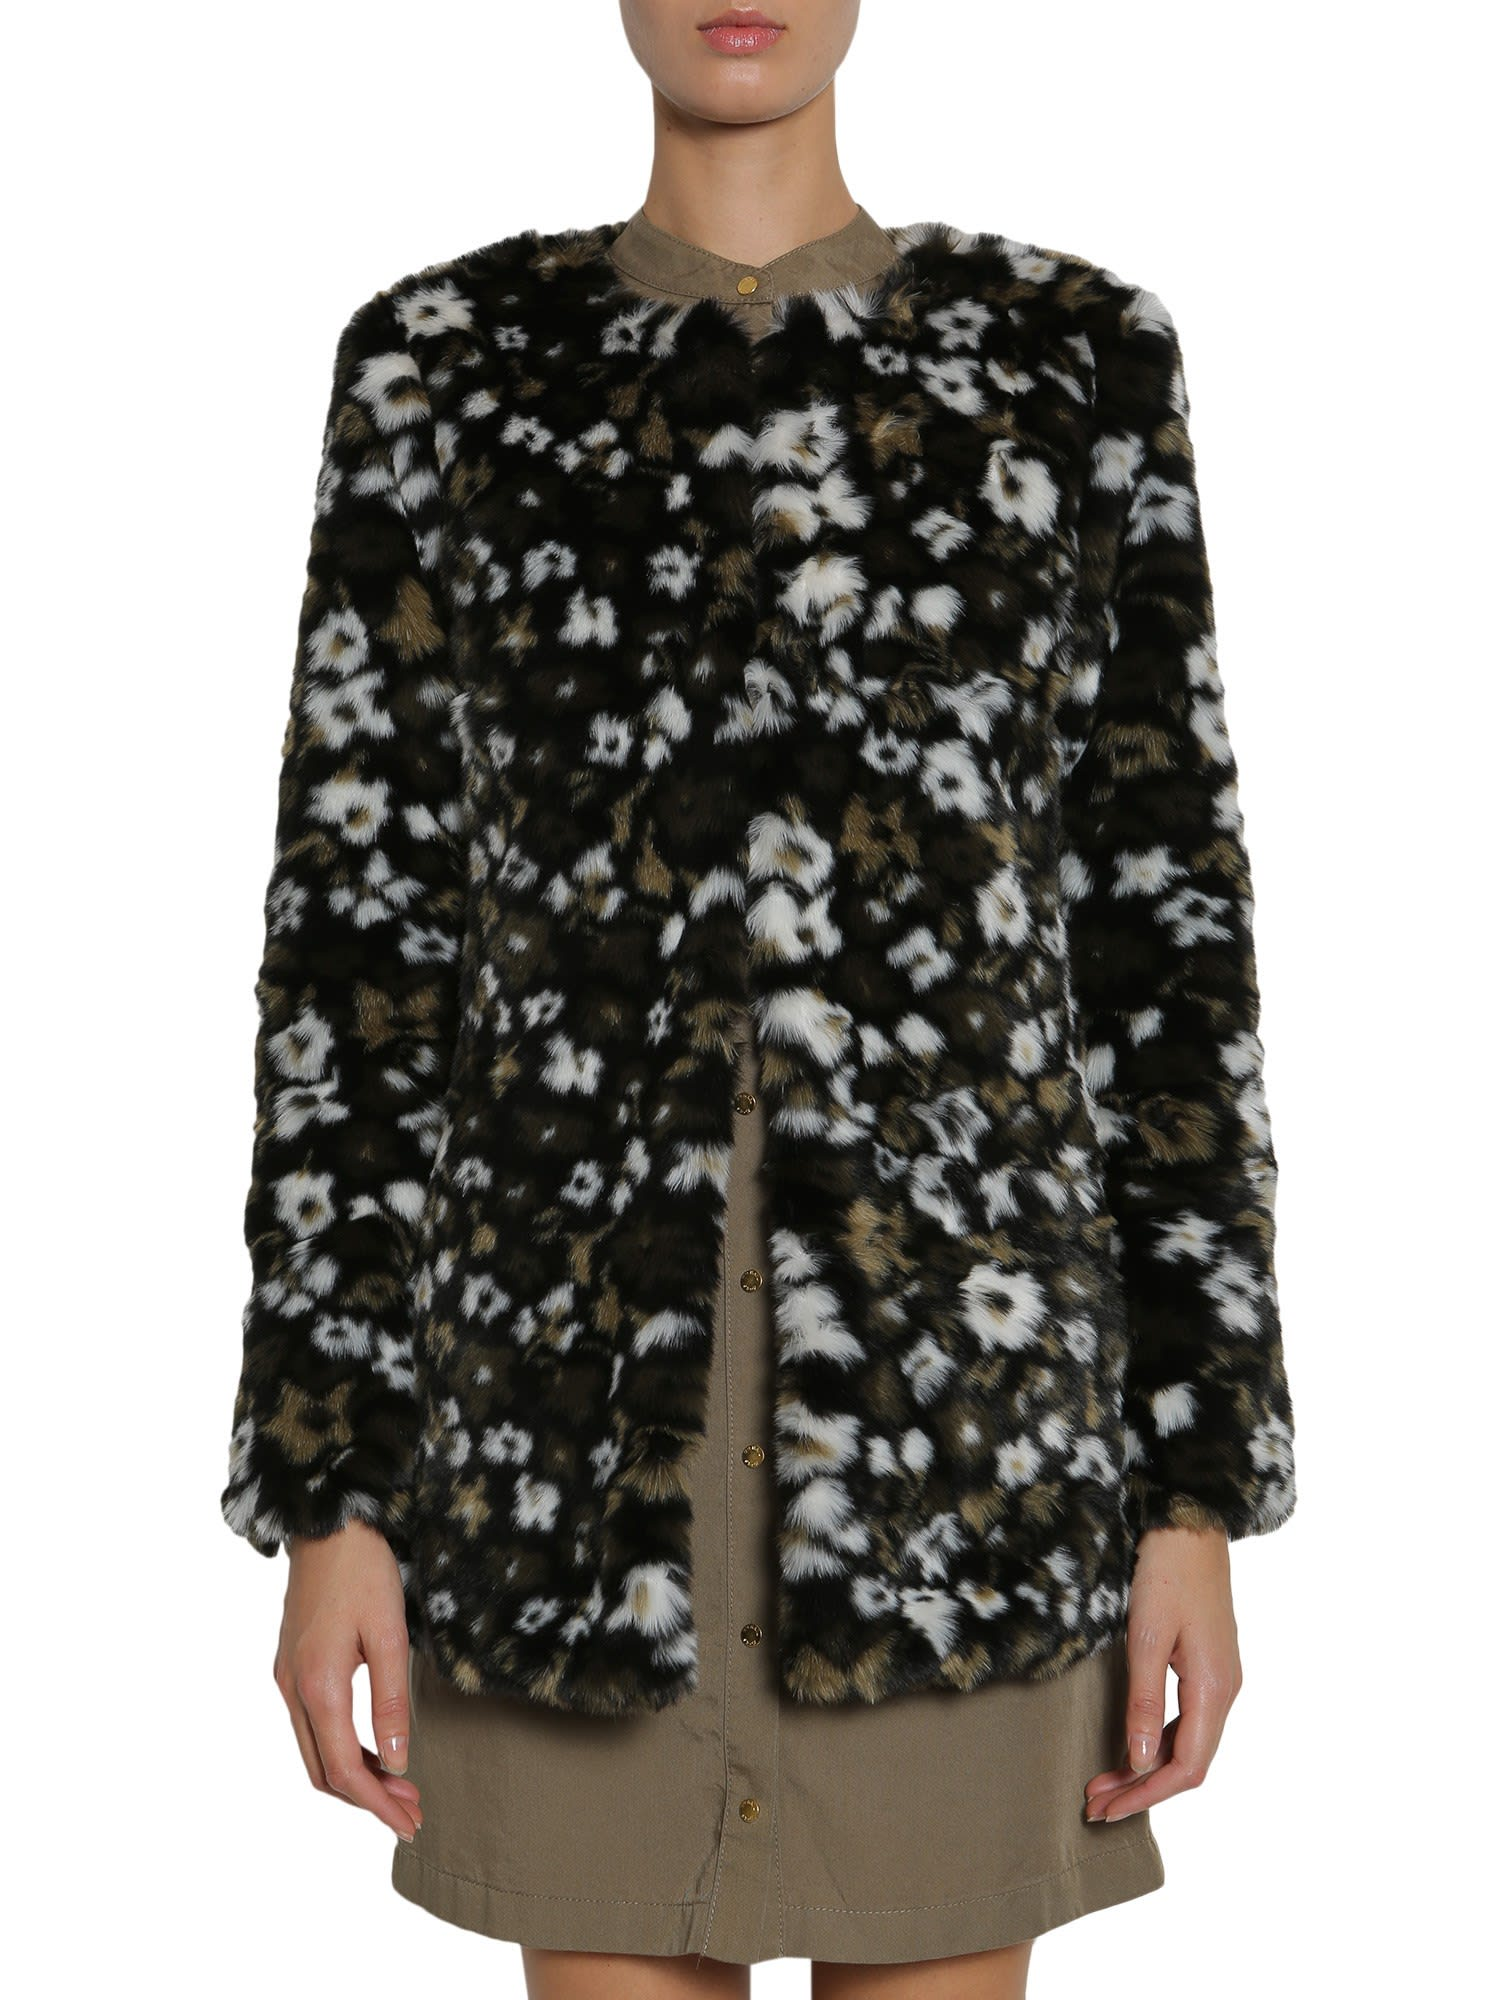 MICHAEL Michael Kors Floral Printed Faux-fur